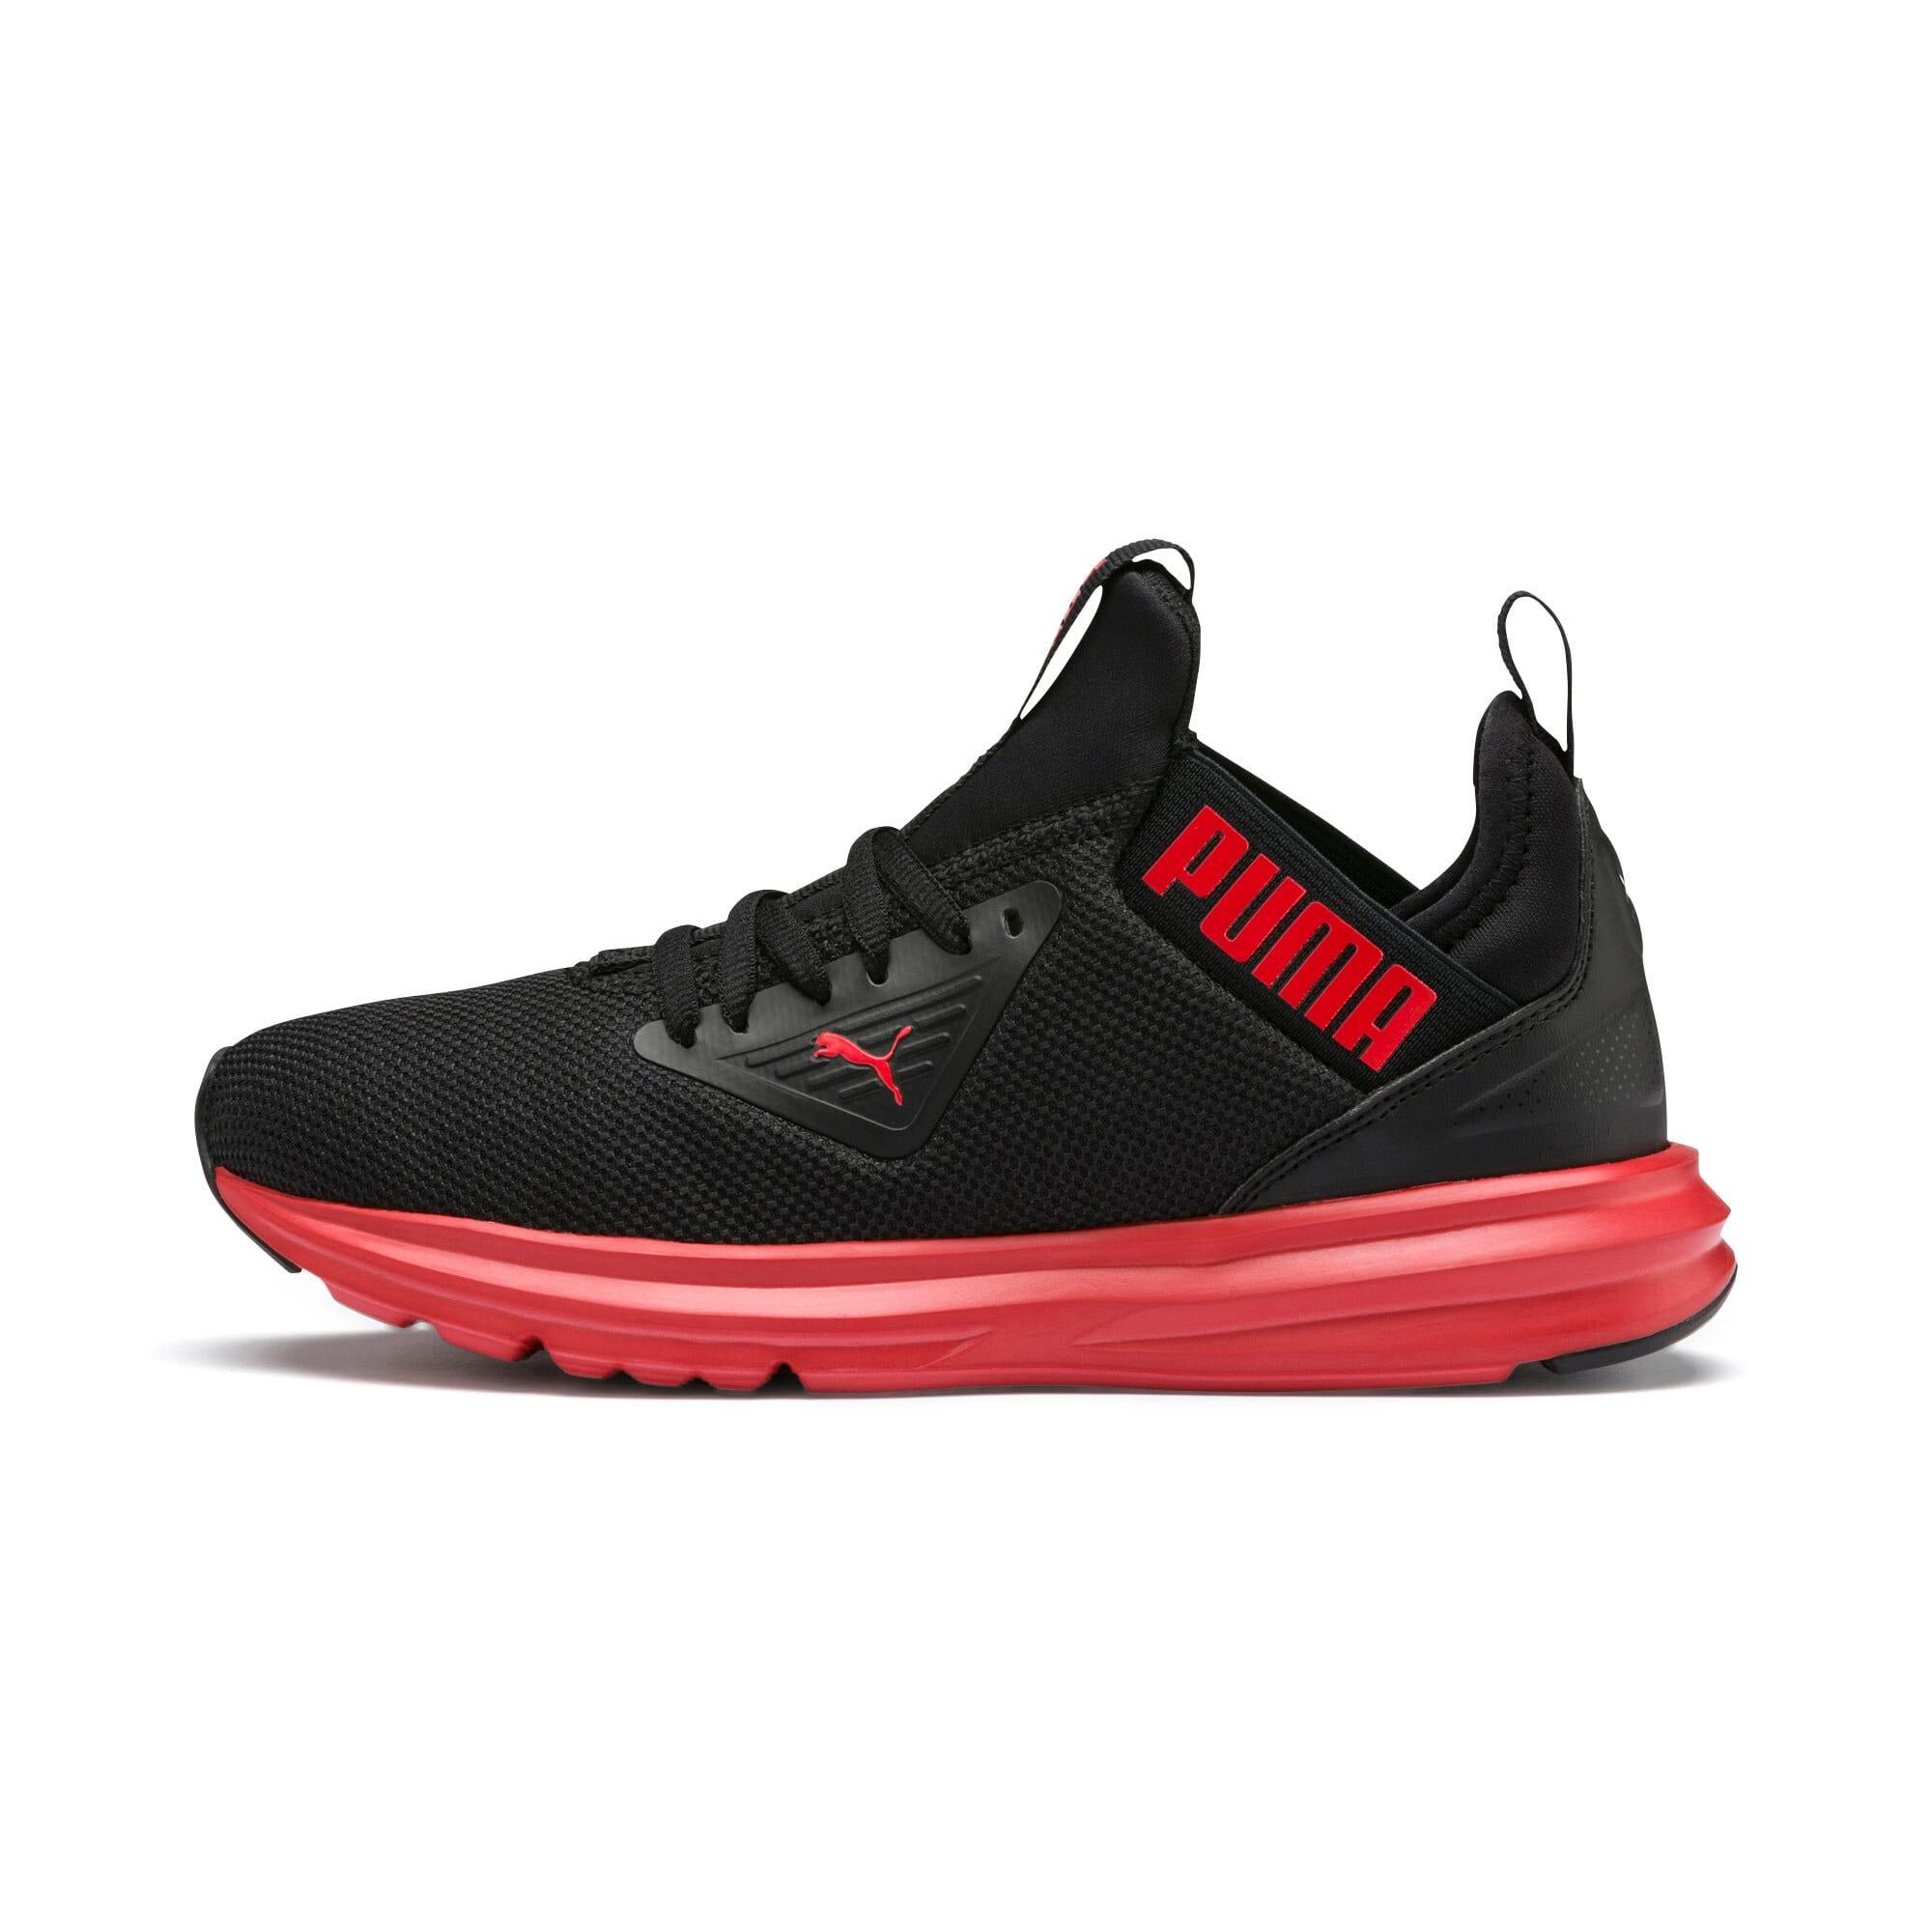 Thumbnail 1 of Enzo Beta Sneakers JR, Puma Black-High Risk Red, medium